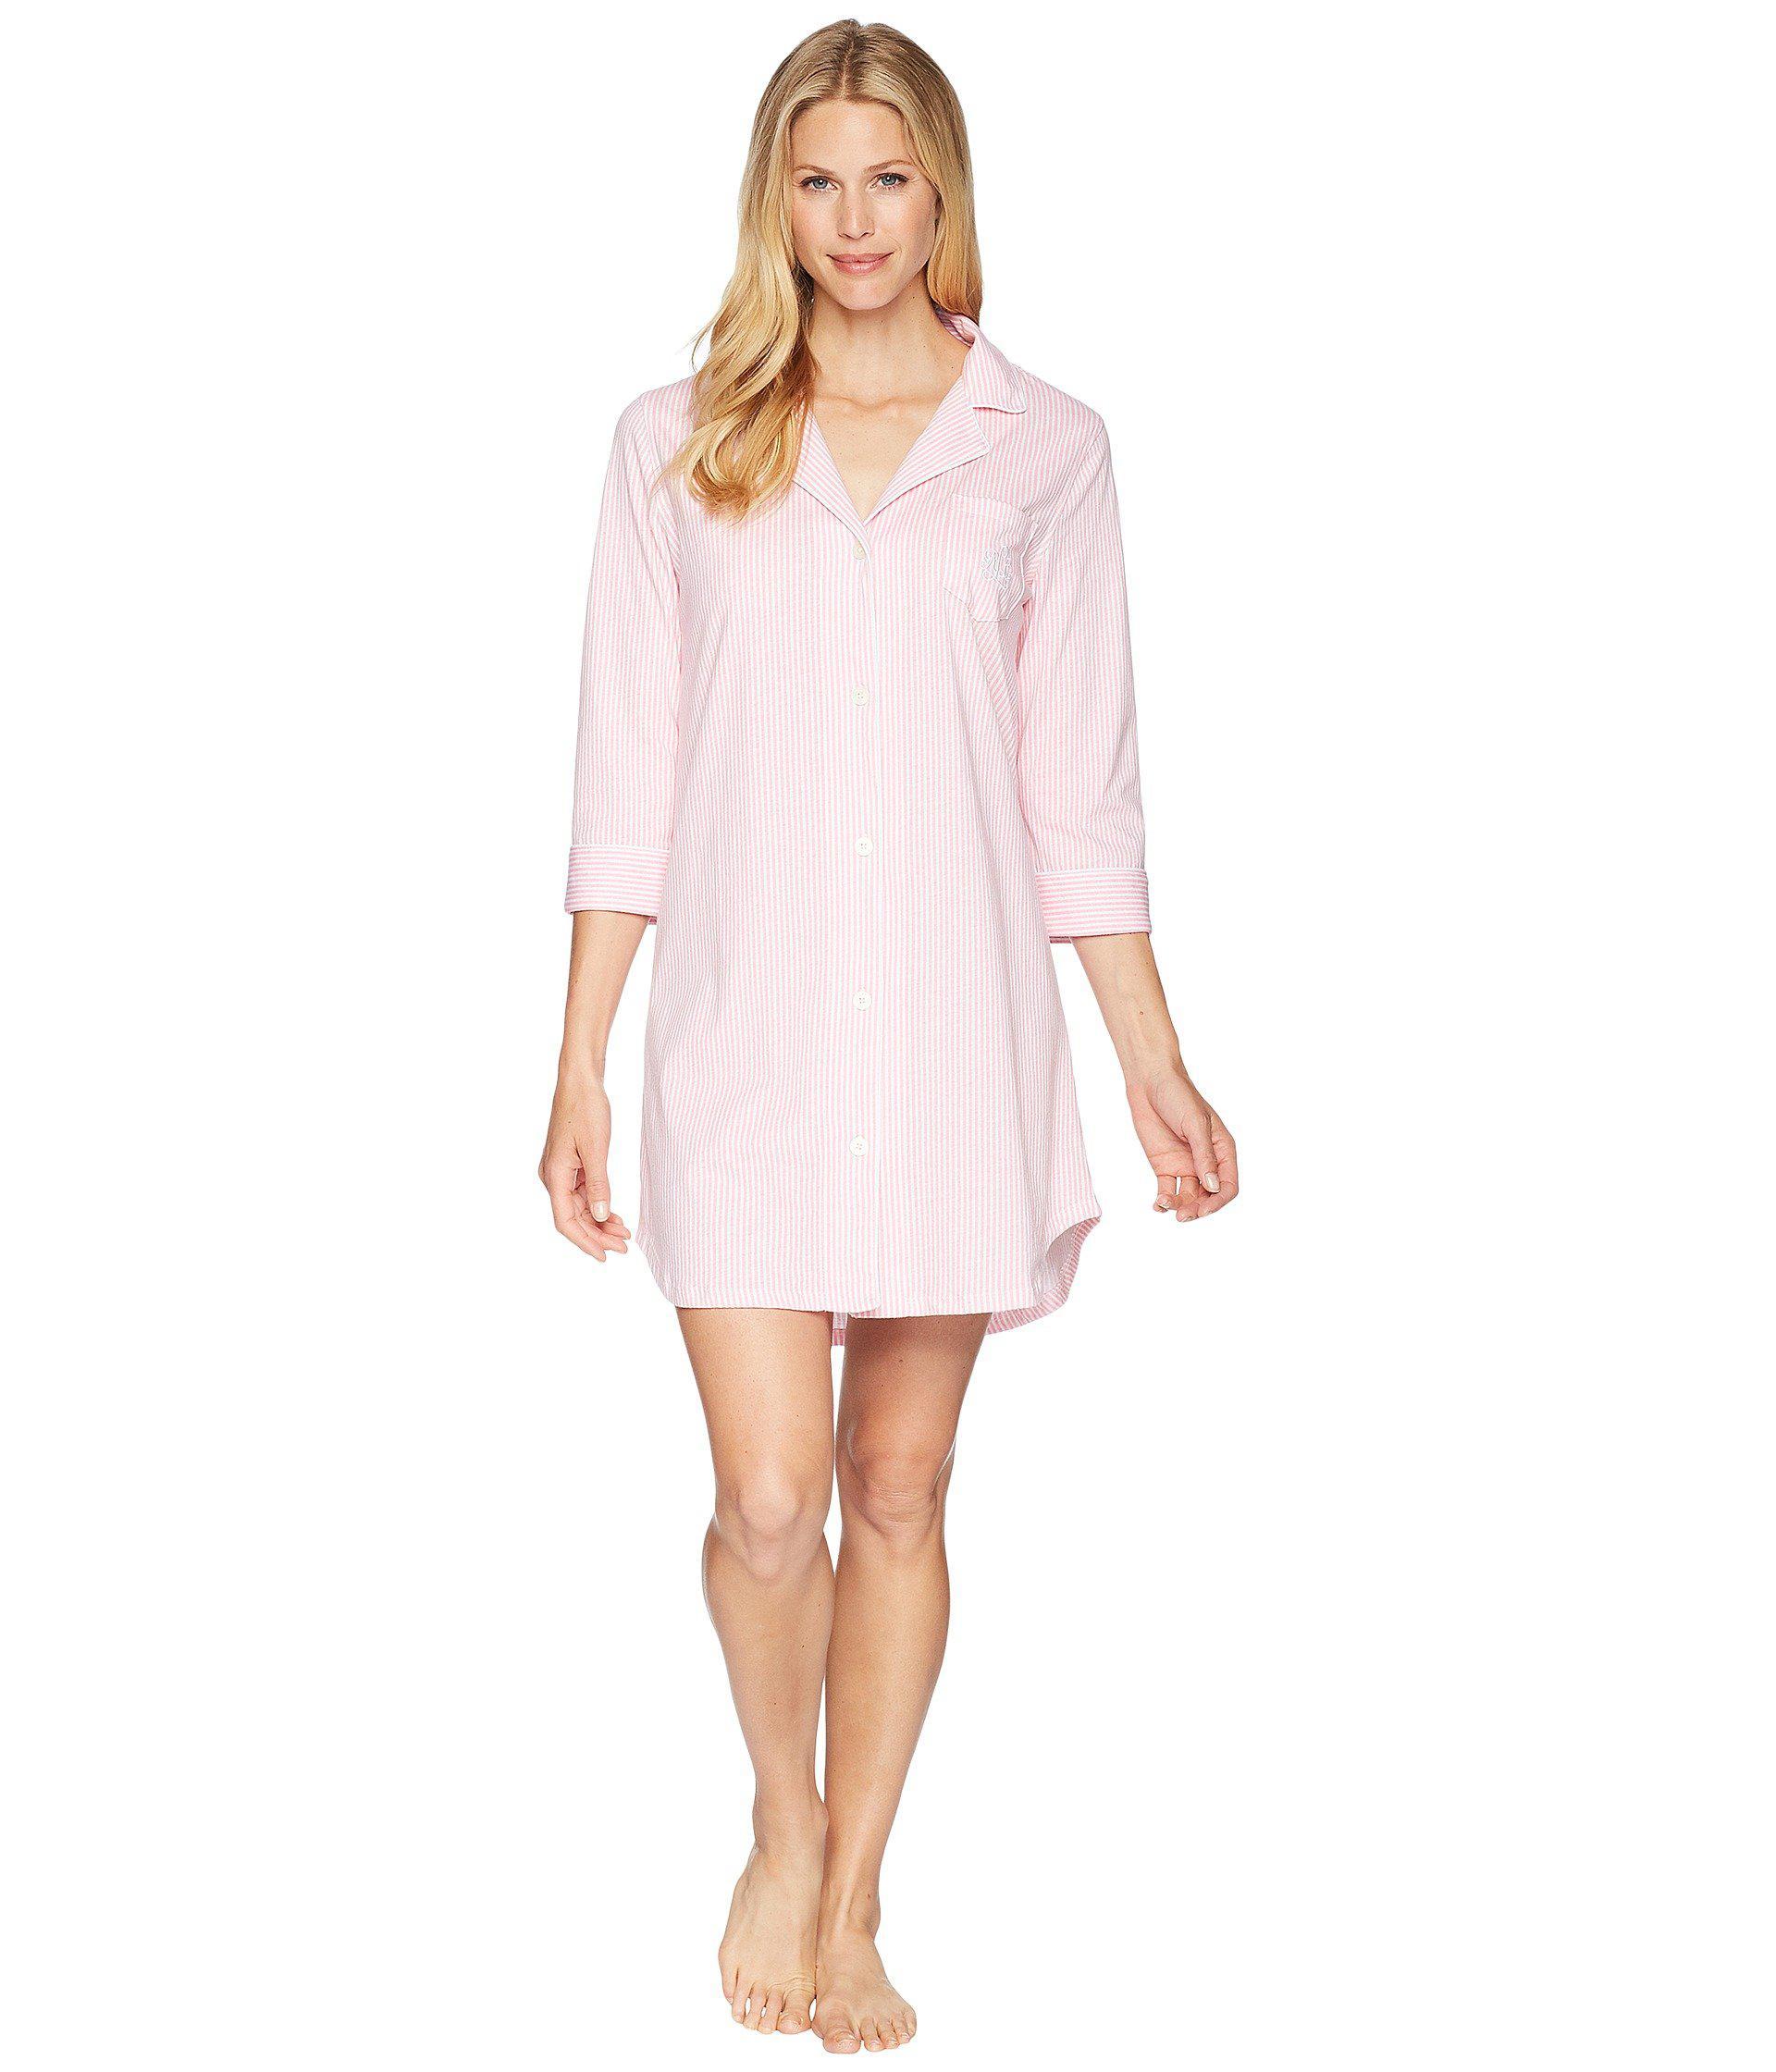 94081e4715ef7 Lauren by Ralph Lauren. Pink Essentials Bingham Knits Sleep Shirt (navy  Polka Dot) Women s Pajama